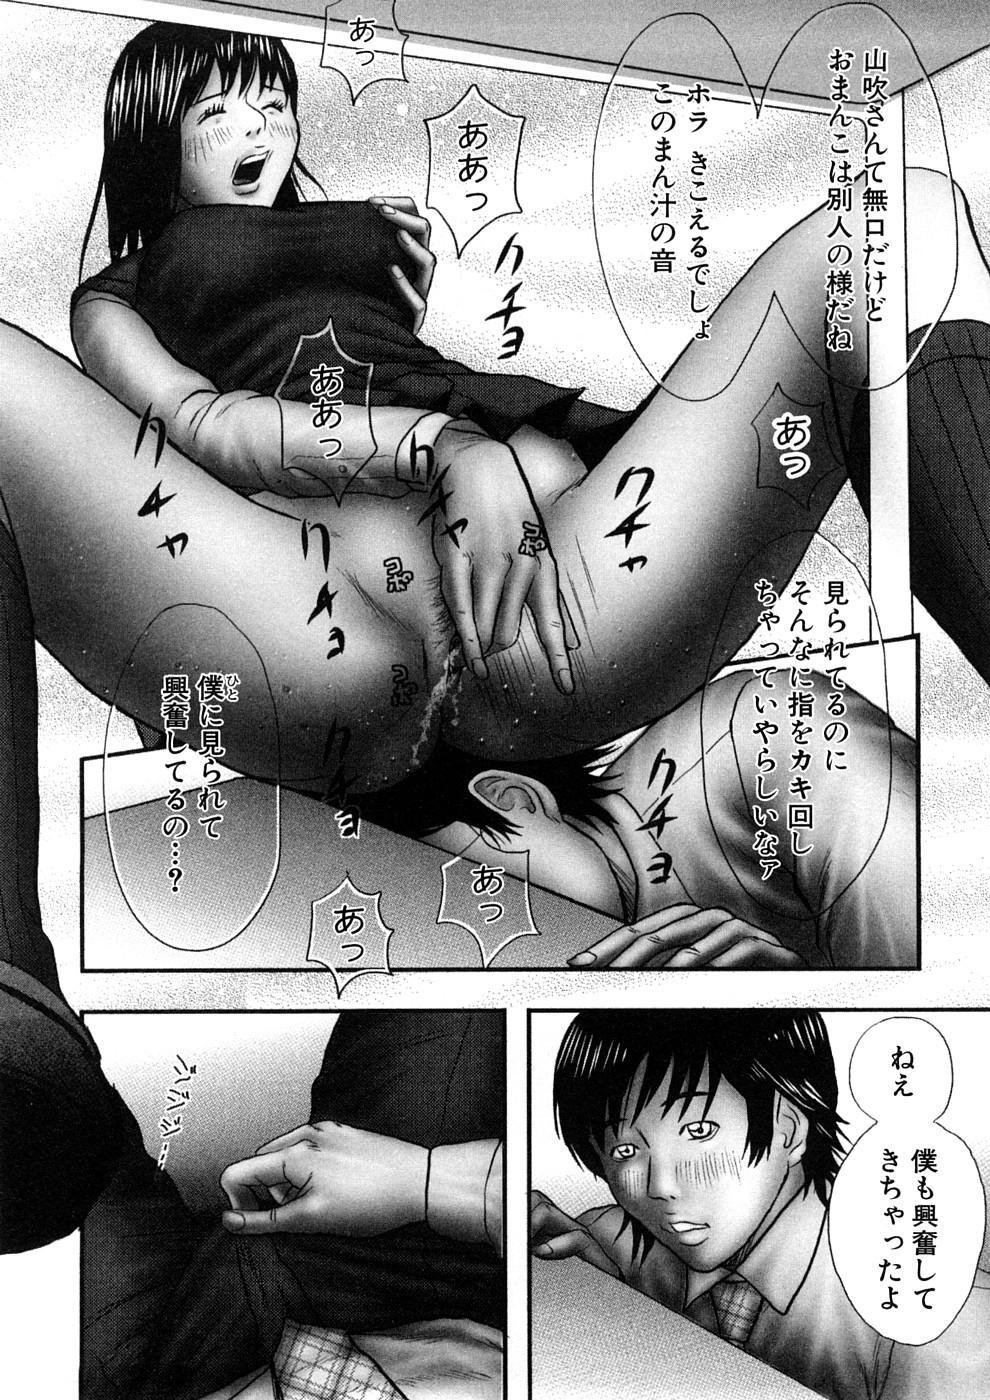 Geki Yaba Anthology Vol. 1 - Naka ni Dashite yo 224